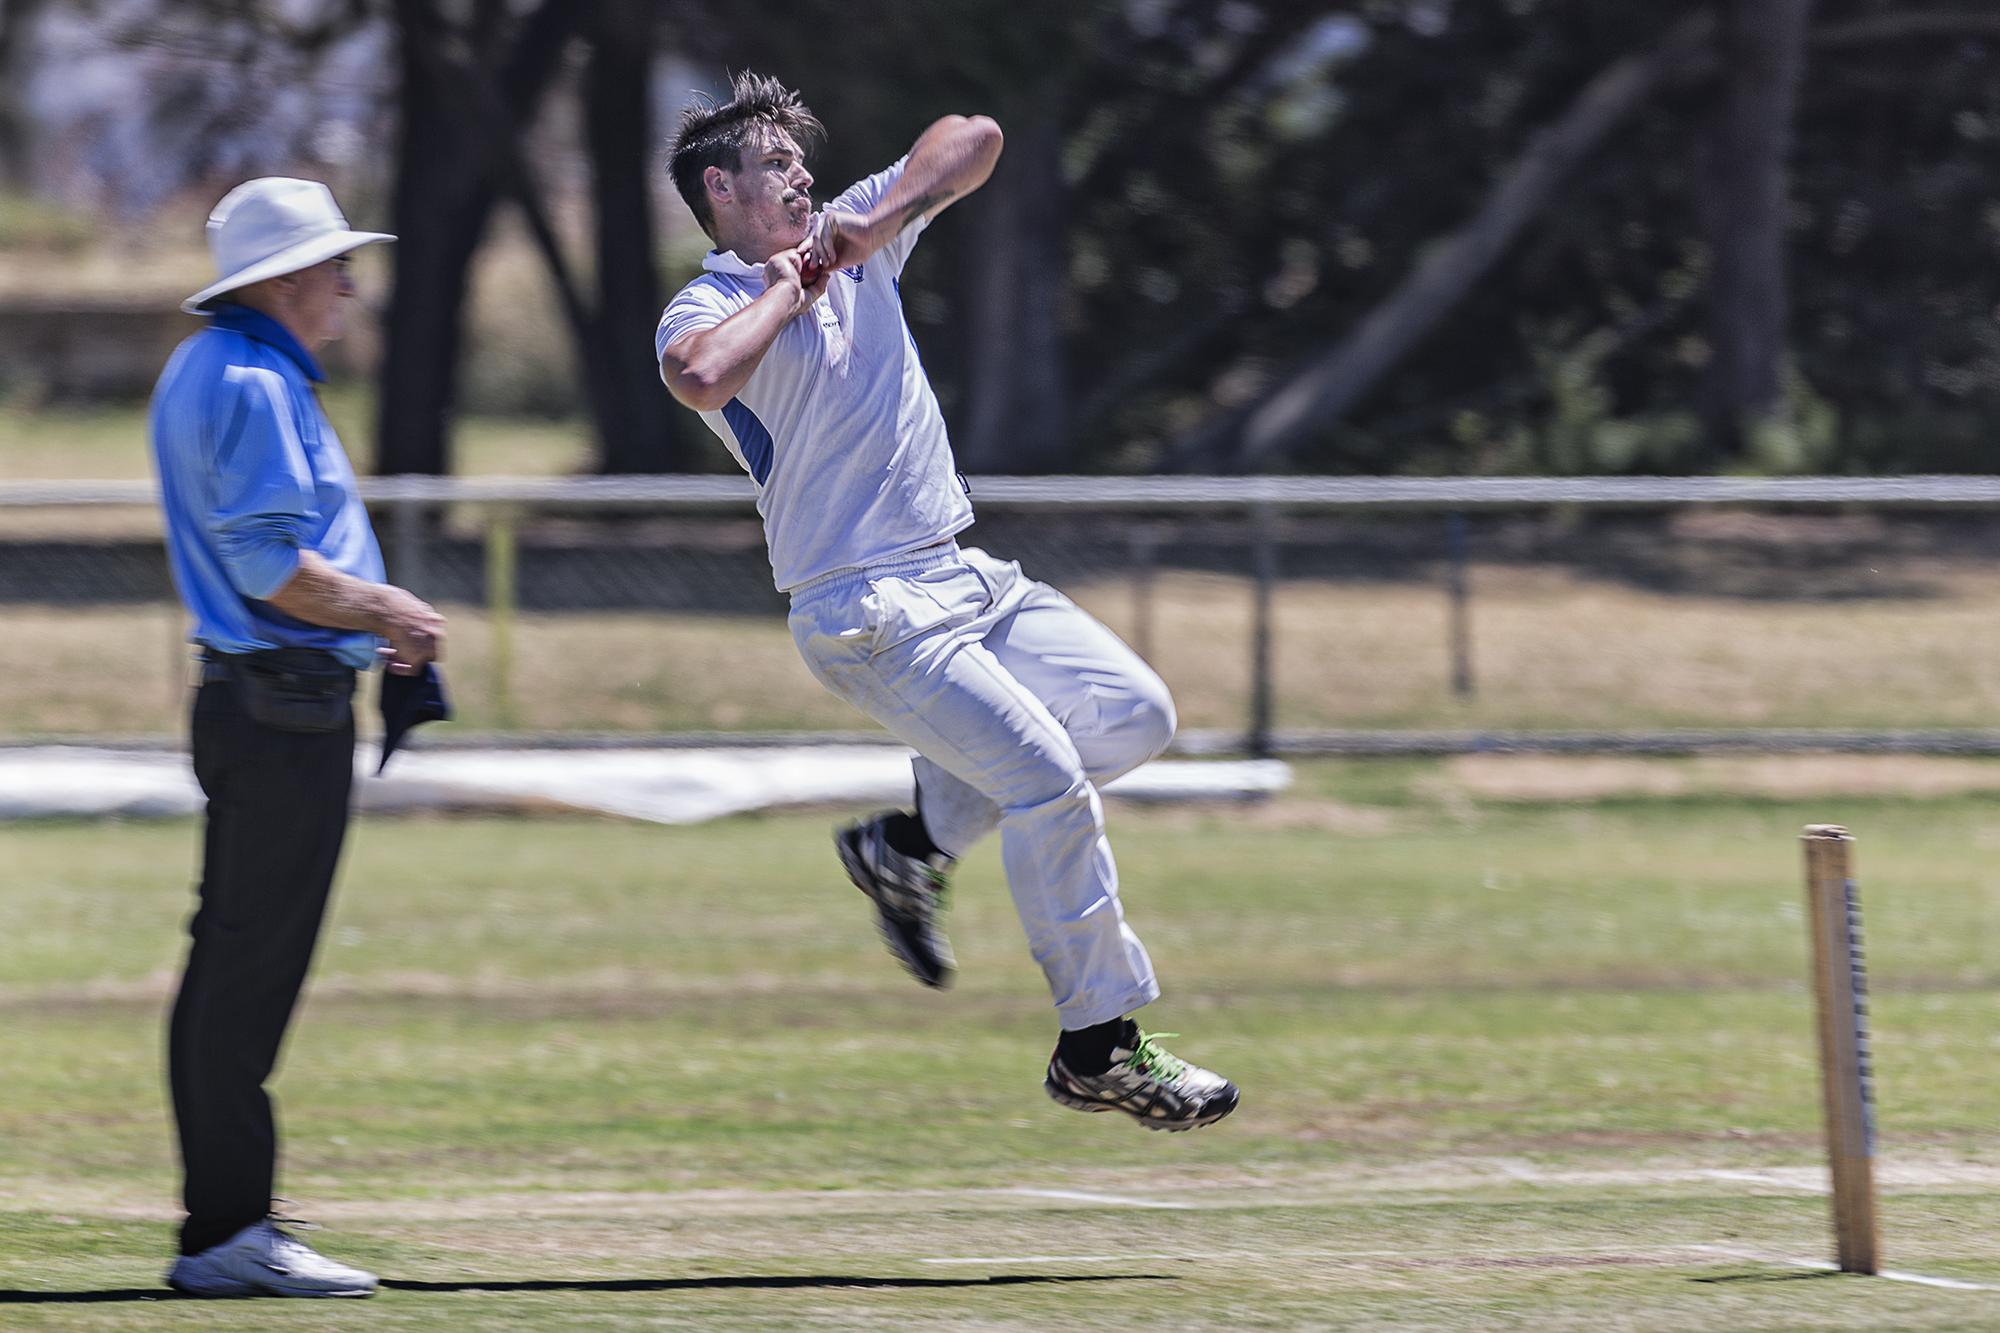 cricket action.jpg